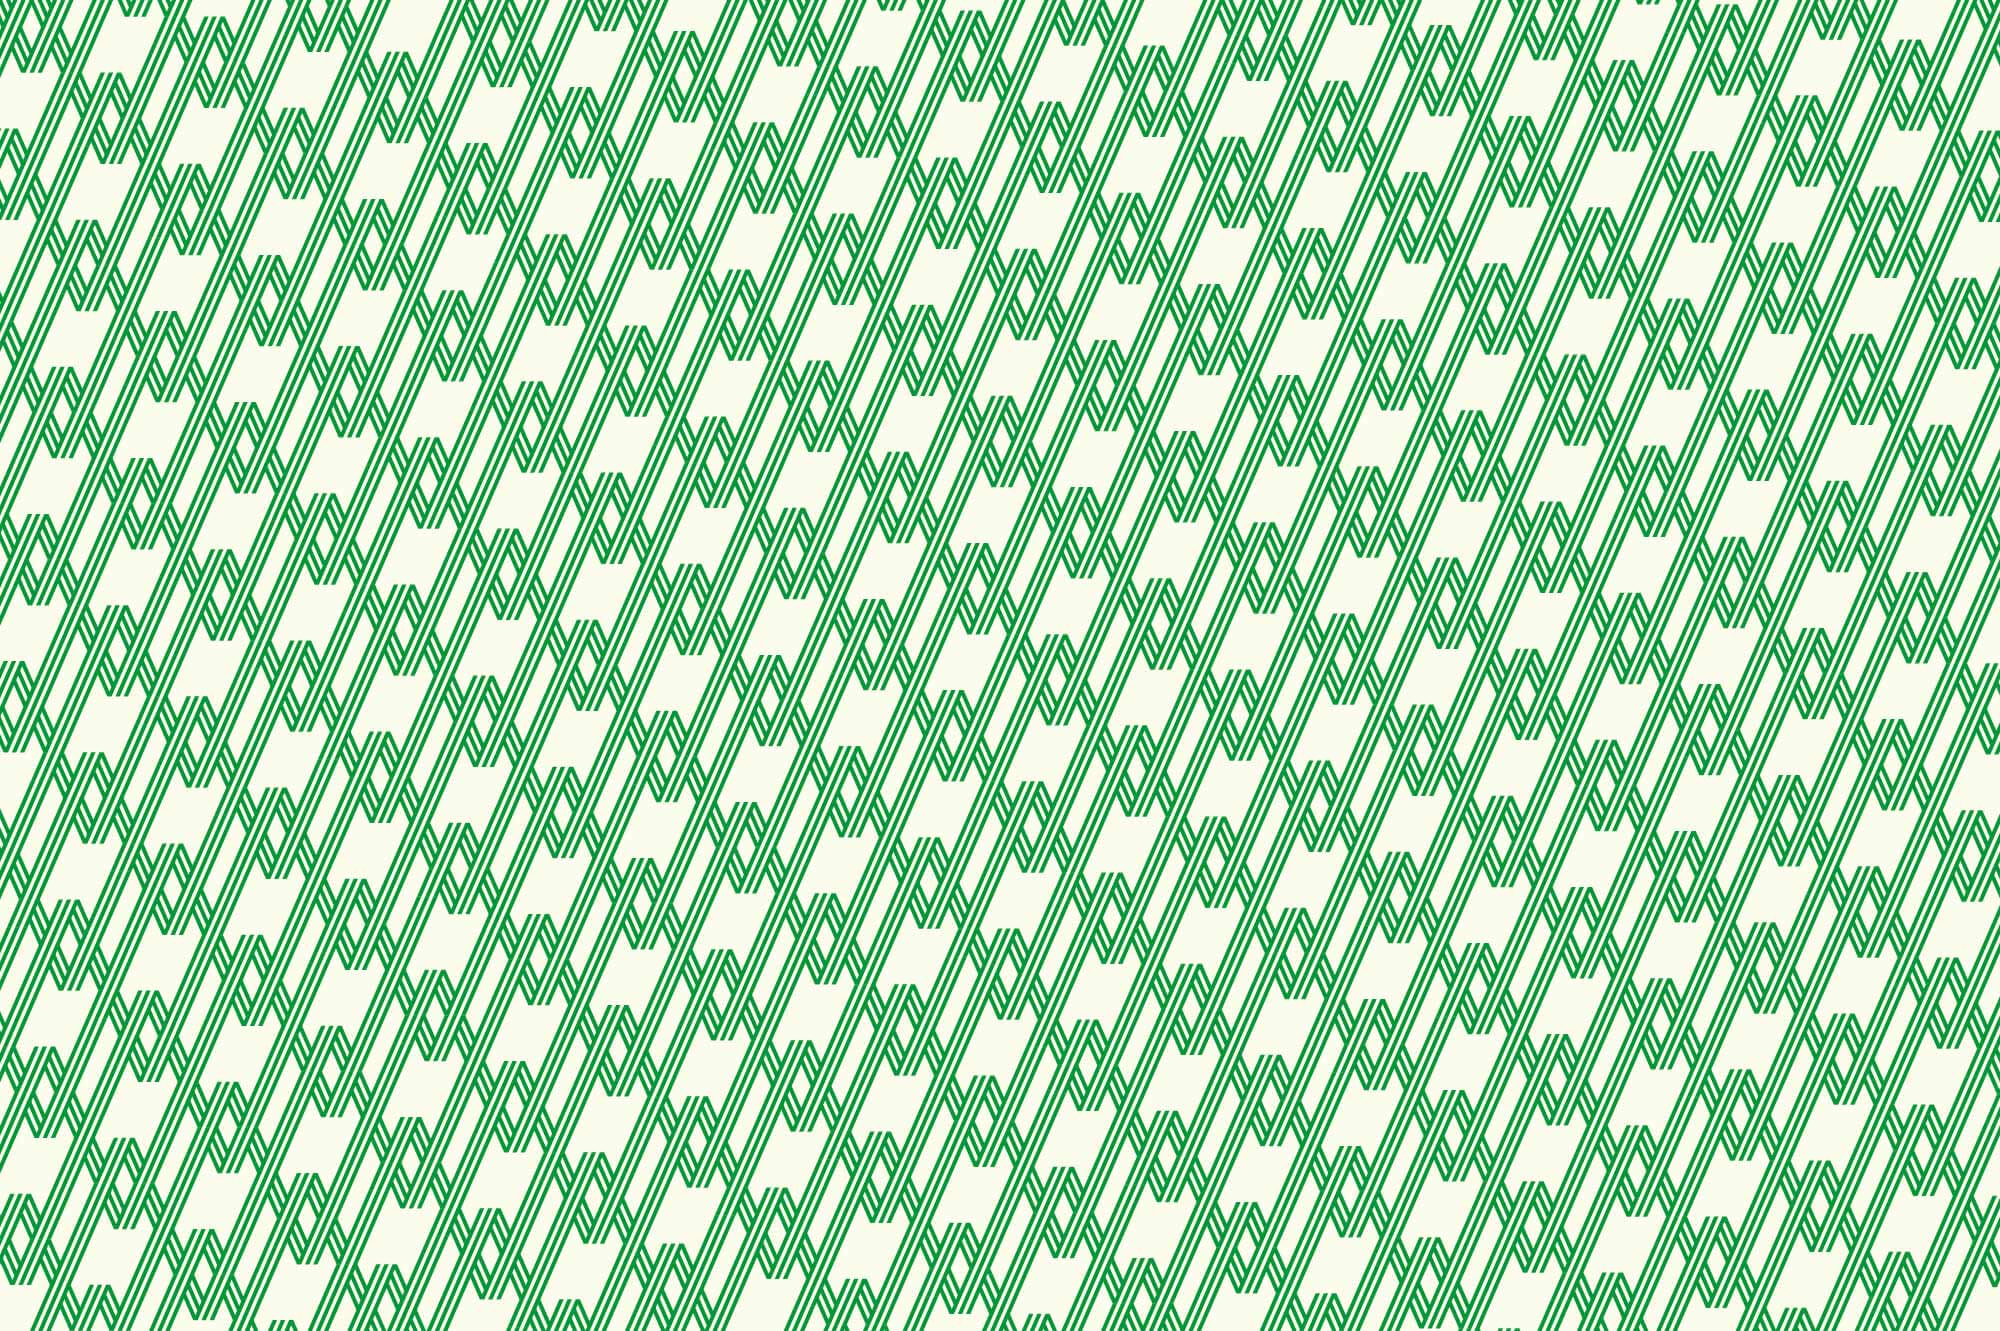 Wastecheck Repeat Pattern